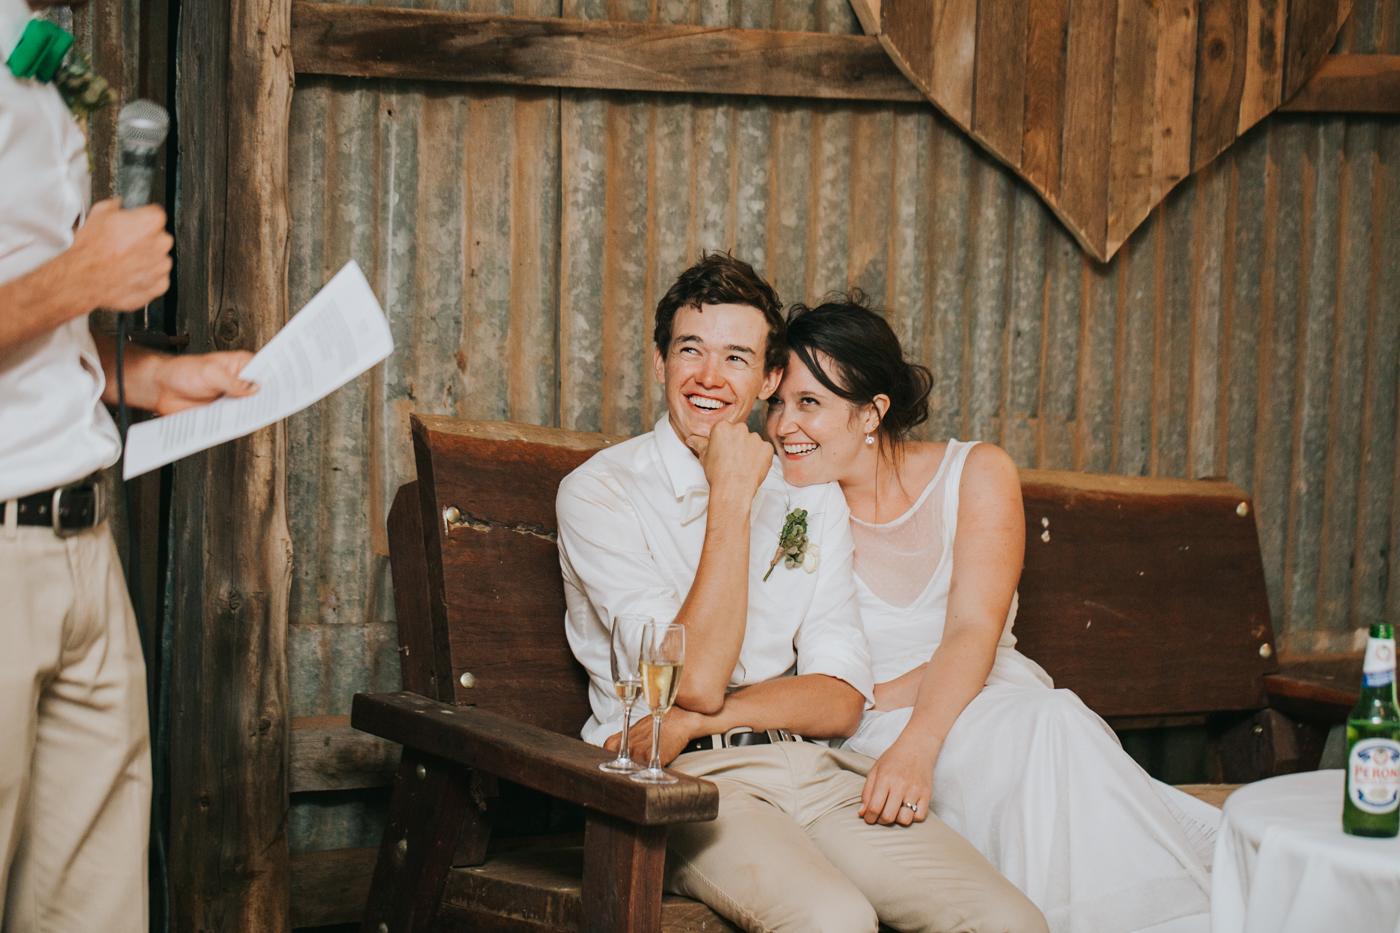 Nicolle & Jacob - Dubbo Wedding - Country Australia - Samantha Heather Photography-267.jpg